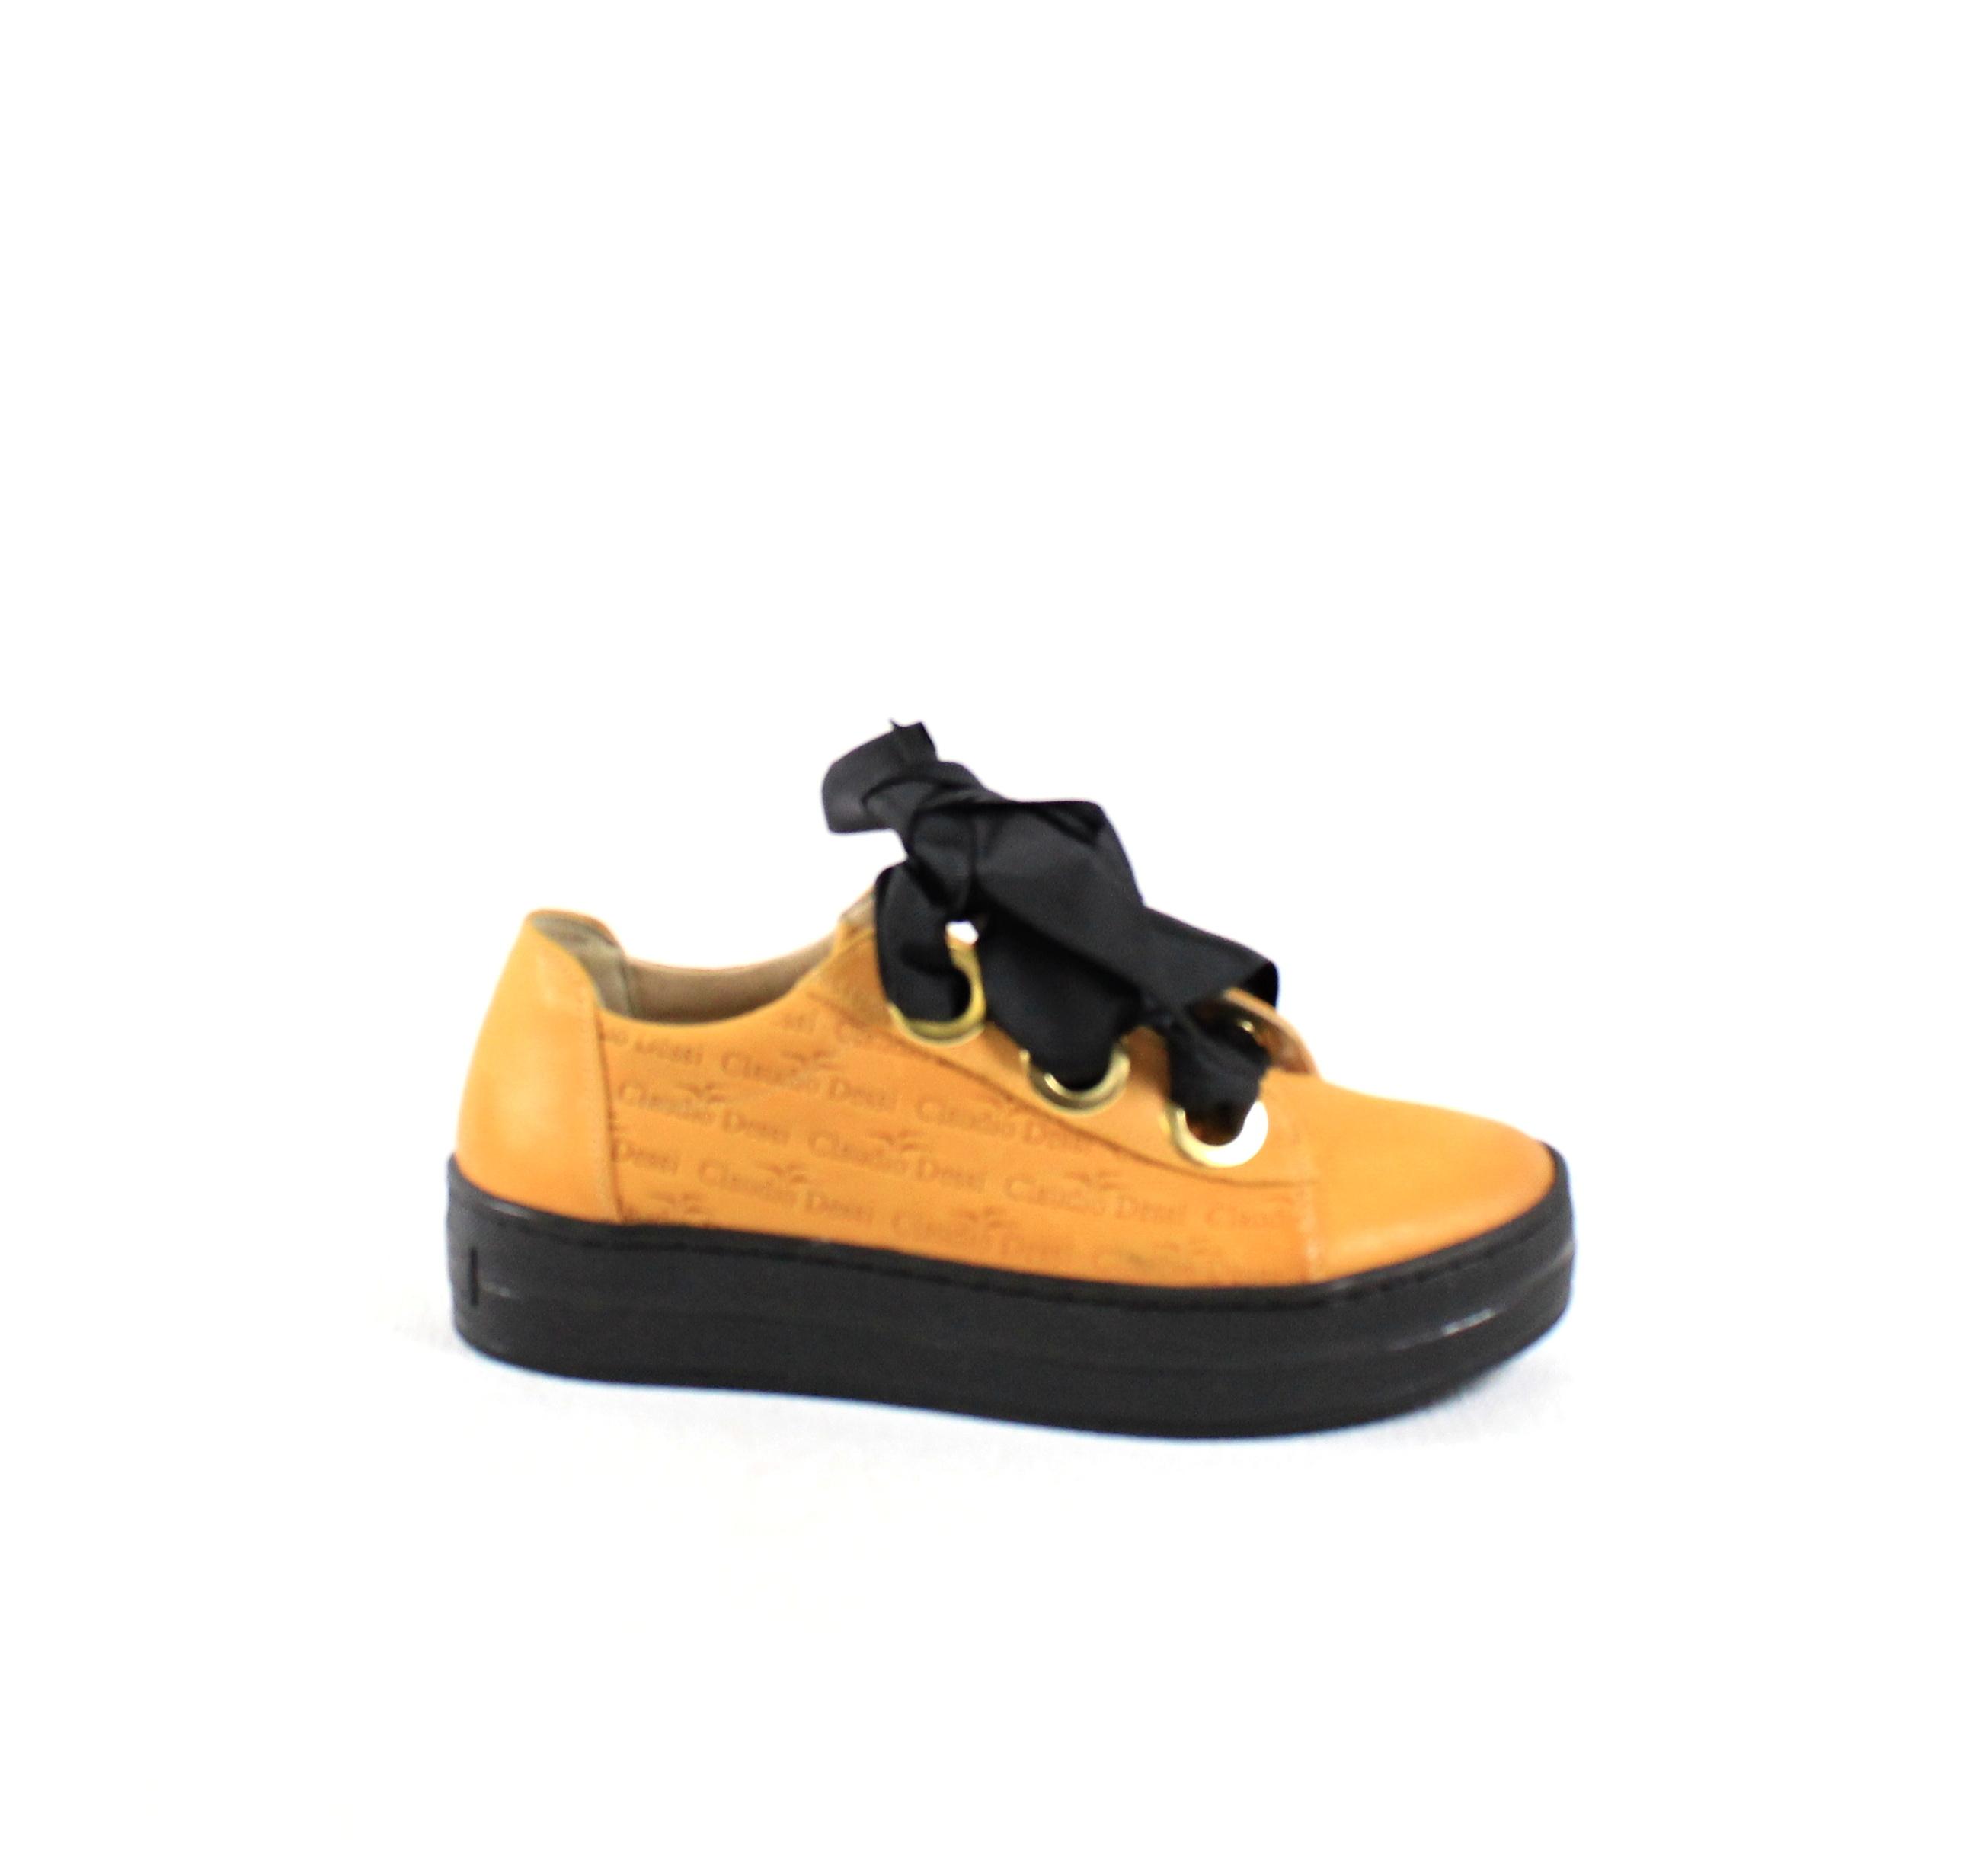 6c112cf477b5 Dámska vychádzková obuv CLAUDIO DESSI 6256-349 – Topánky Olympia shoes